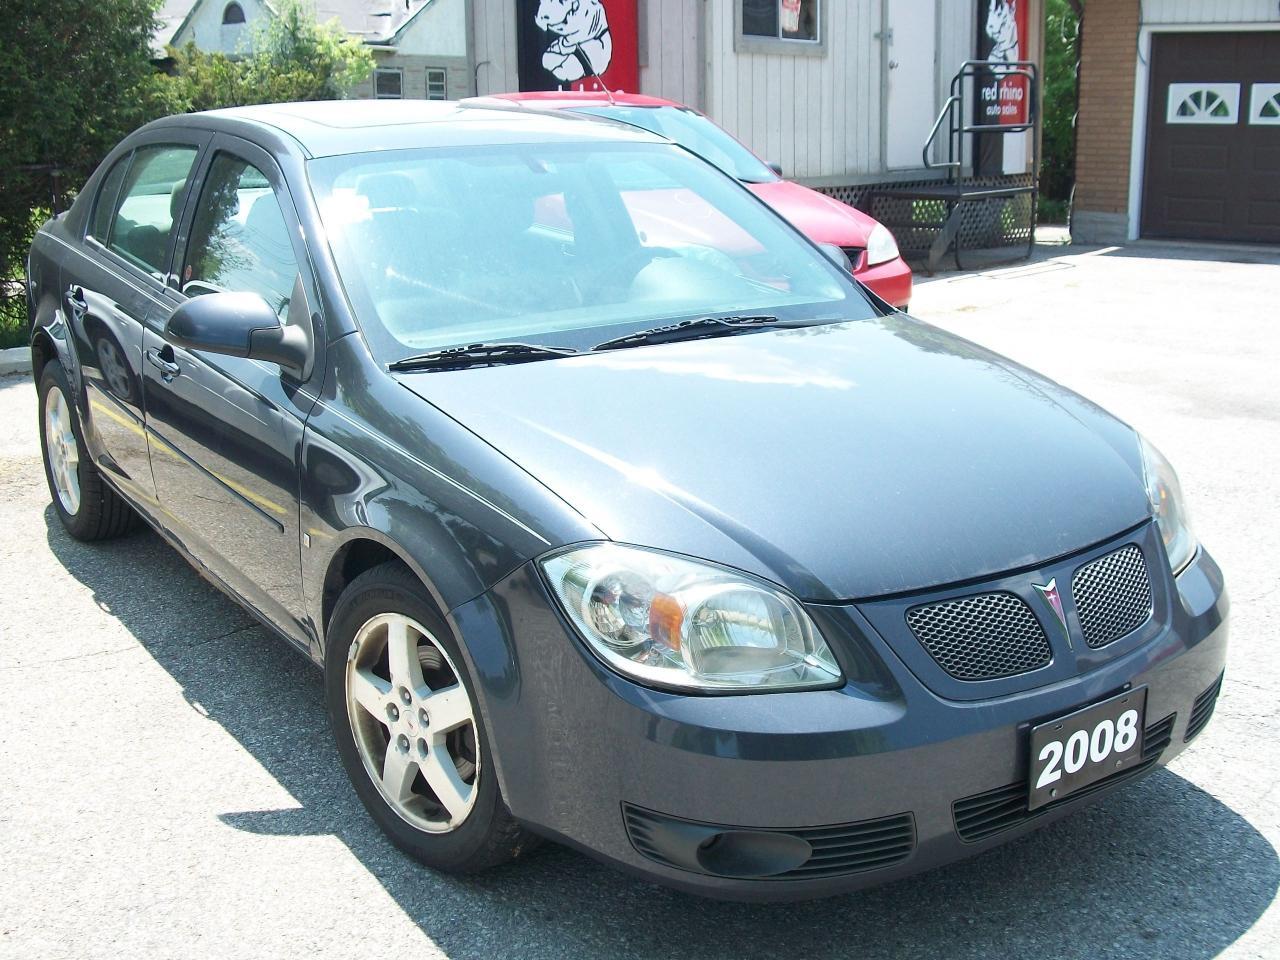 Photo of Gray 2008 Pontiac G5